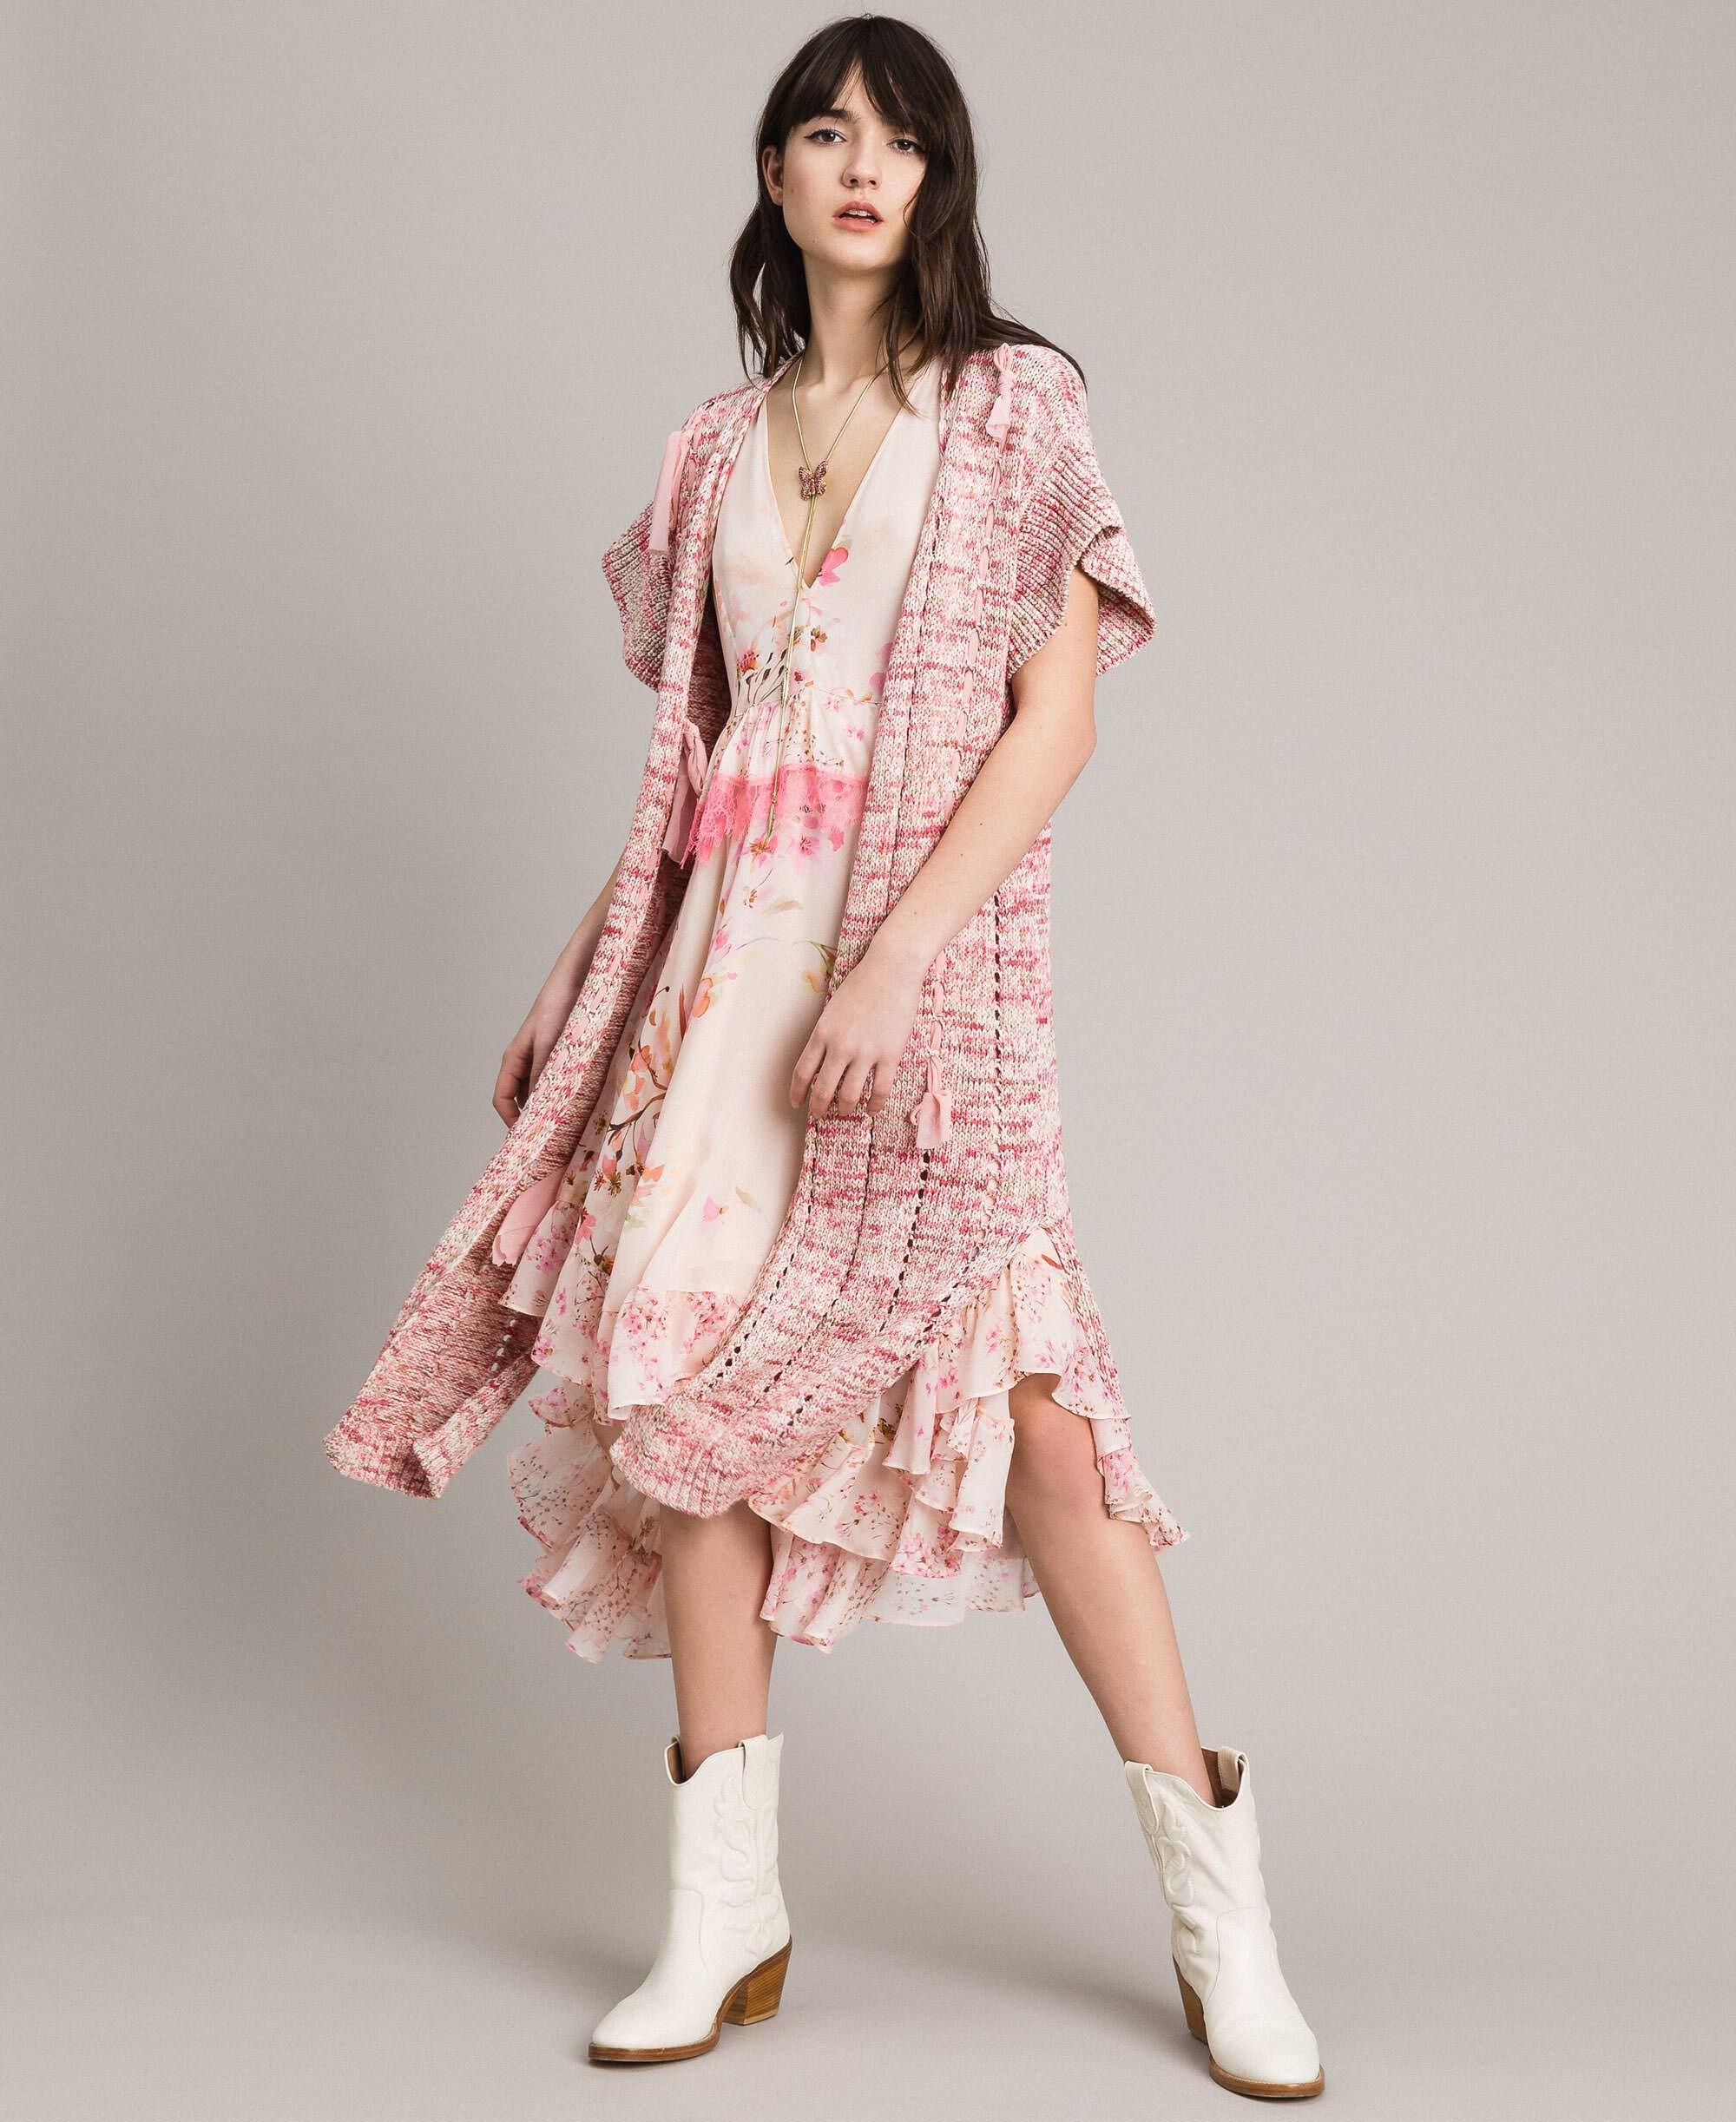 d341a312e37 Cardigans Woman - Spring Summer 2019